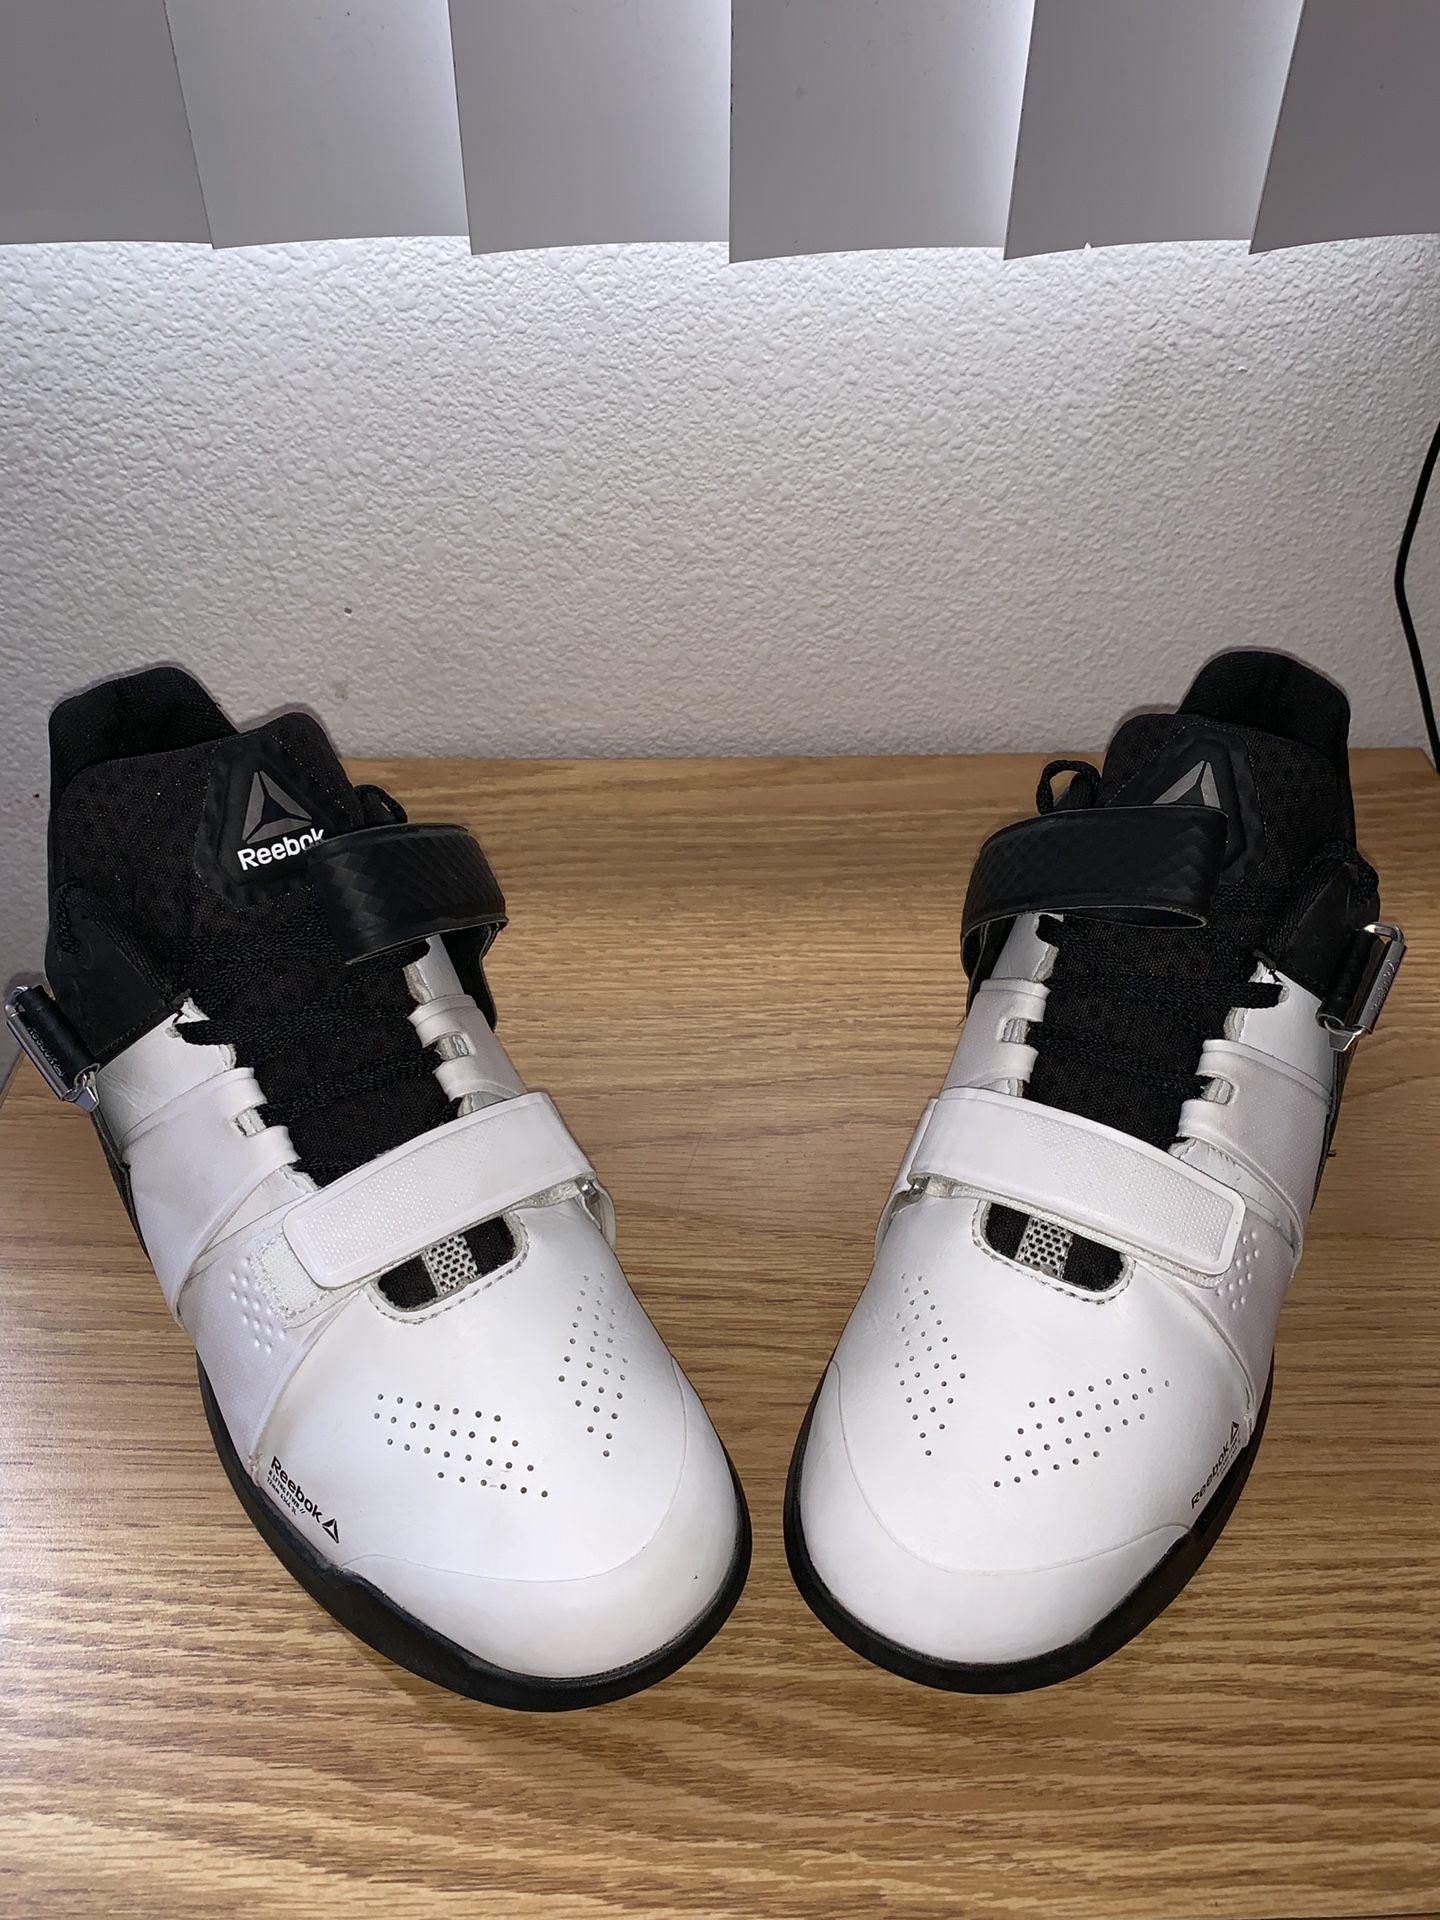 Reebok legacy lifters squat shoes